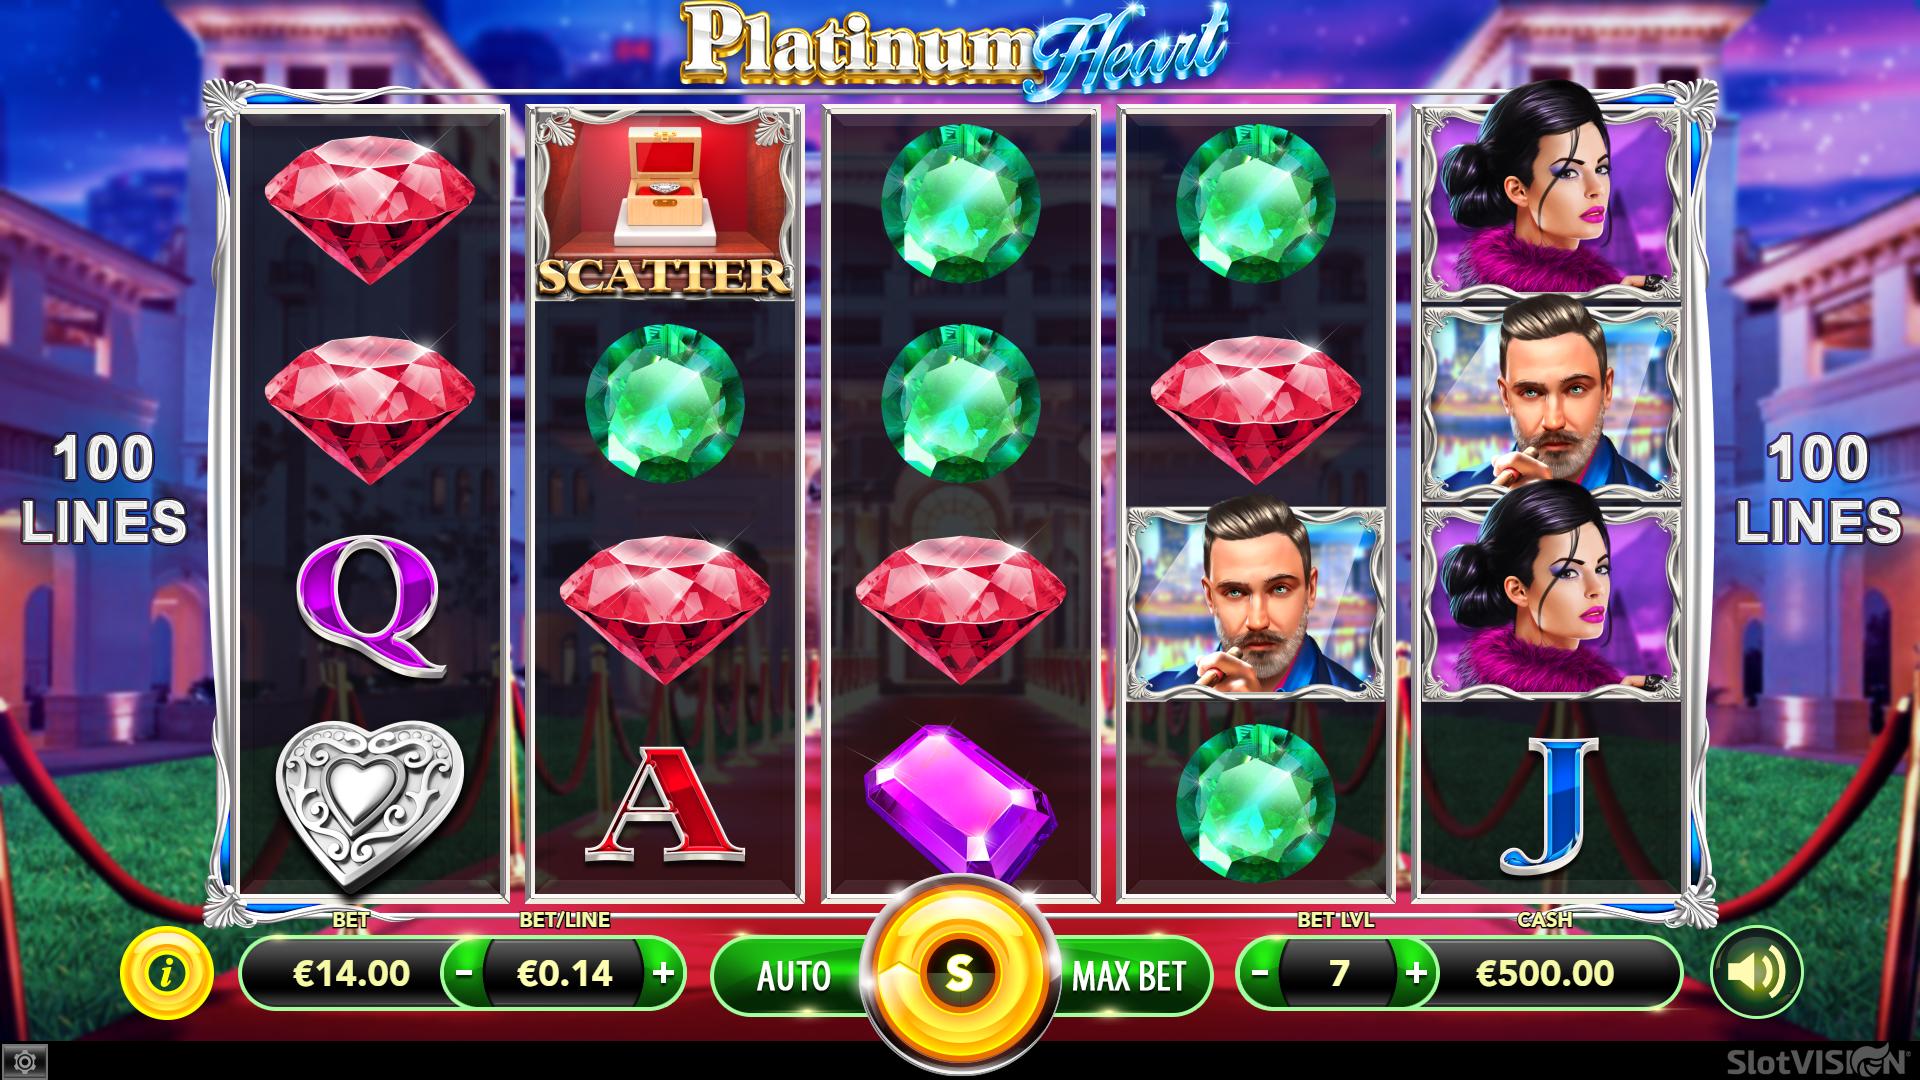 Platinum Play Casino 10 Free